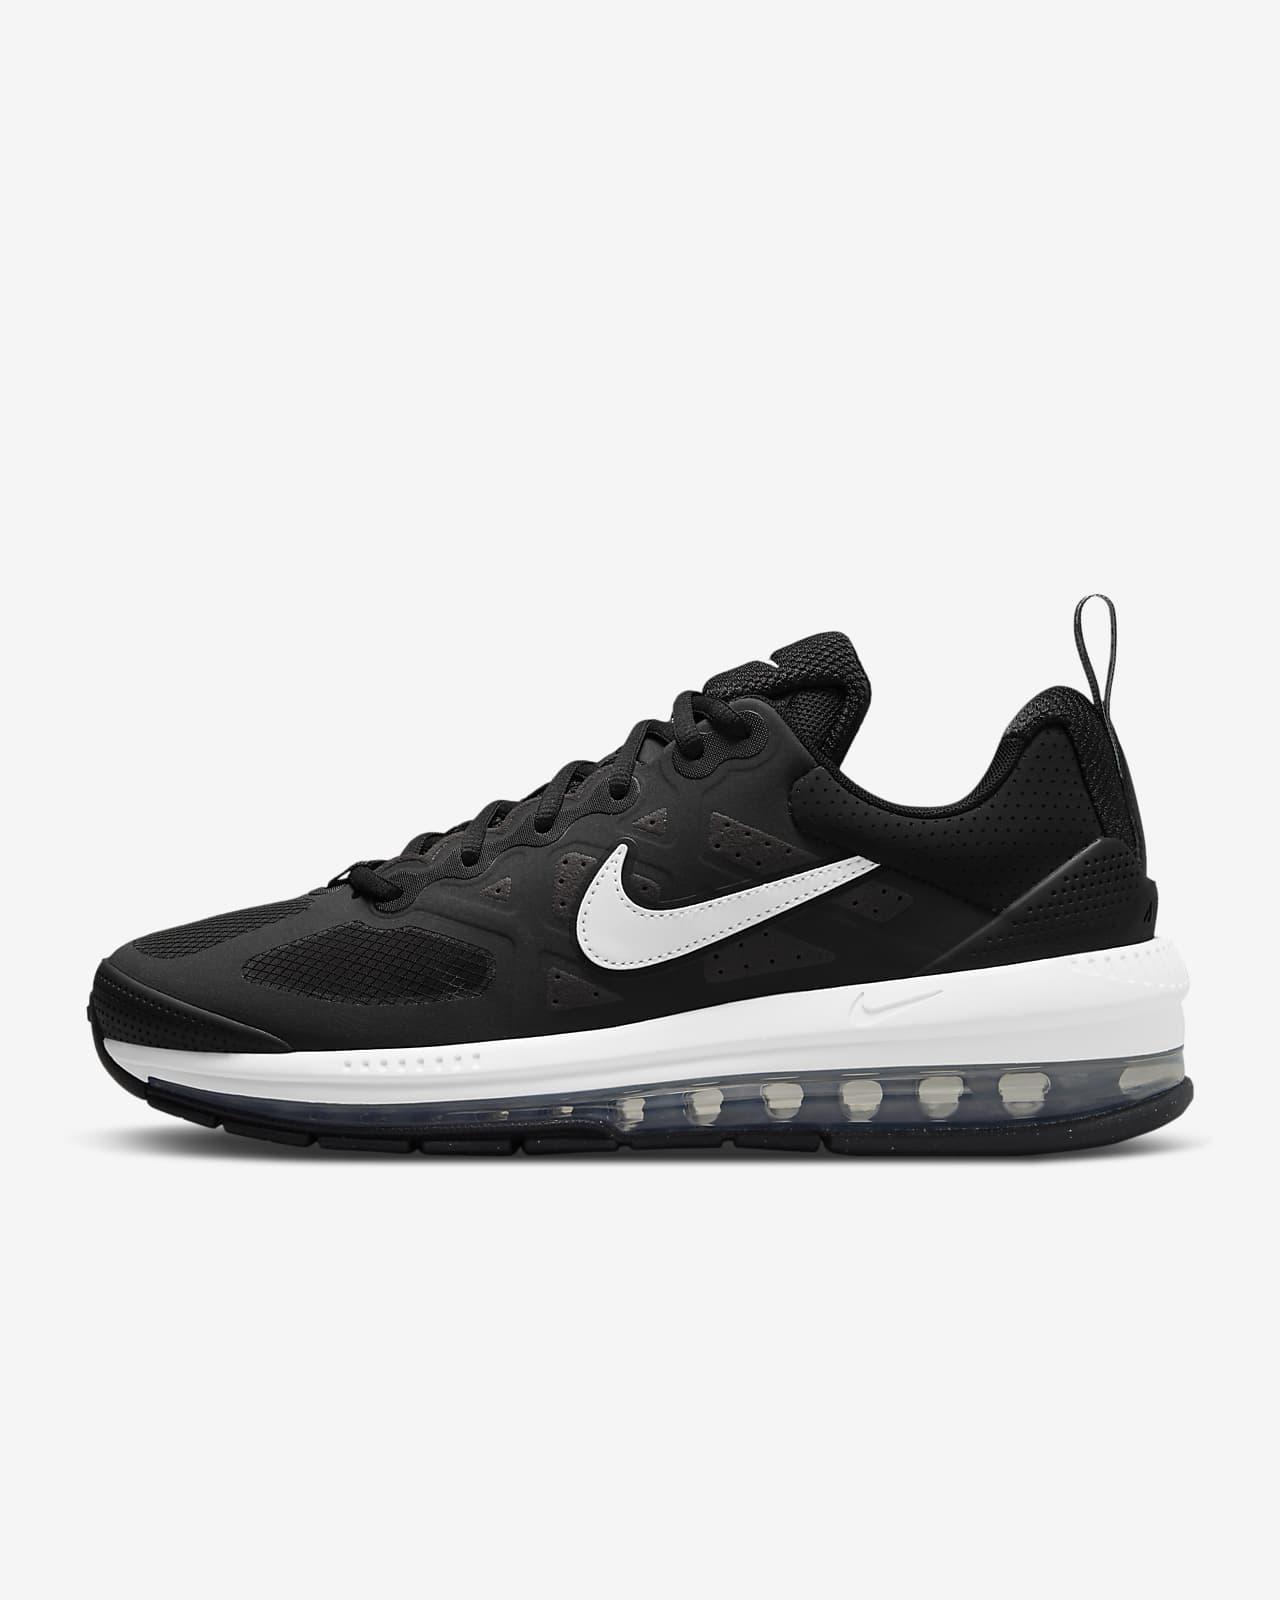 Nike Air Max Genome Men's Shoes. Nike LU